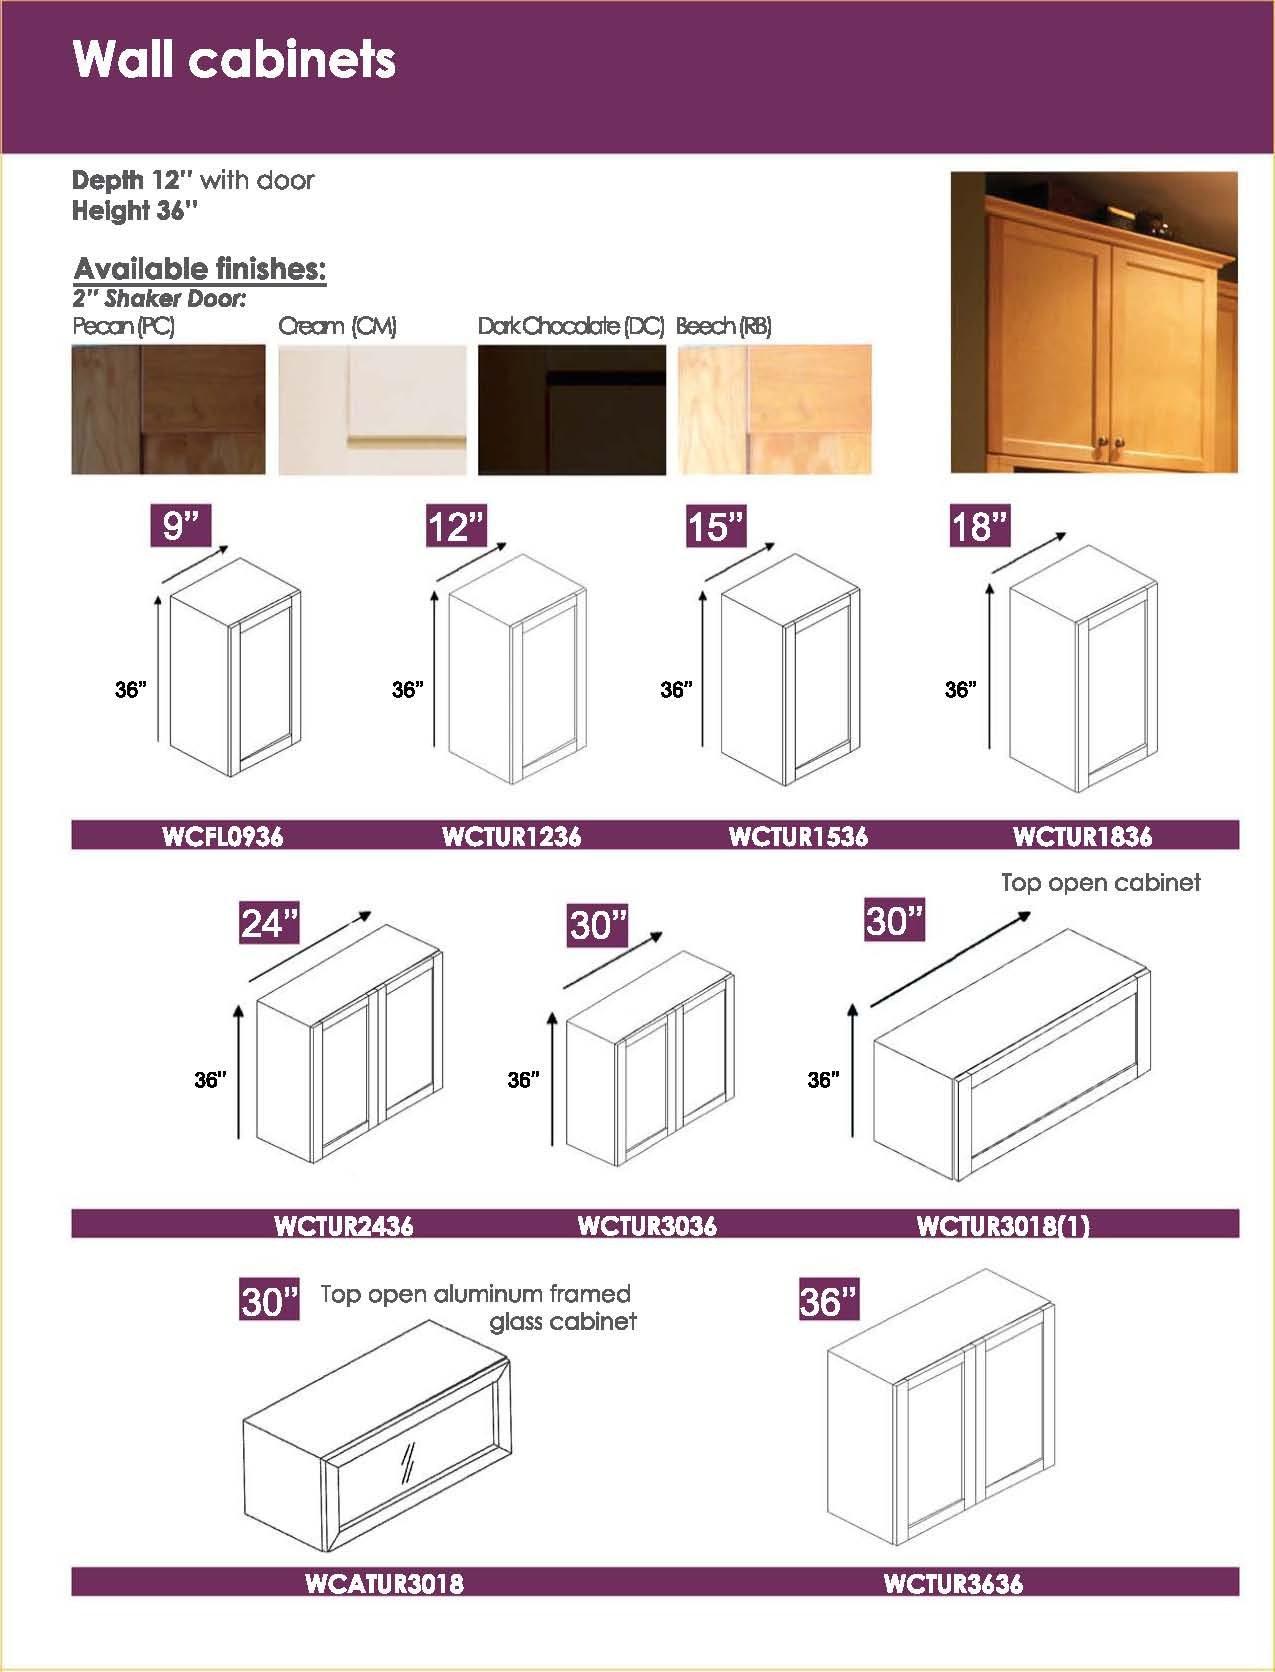 Kitchen Wall CabiDimensions